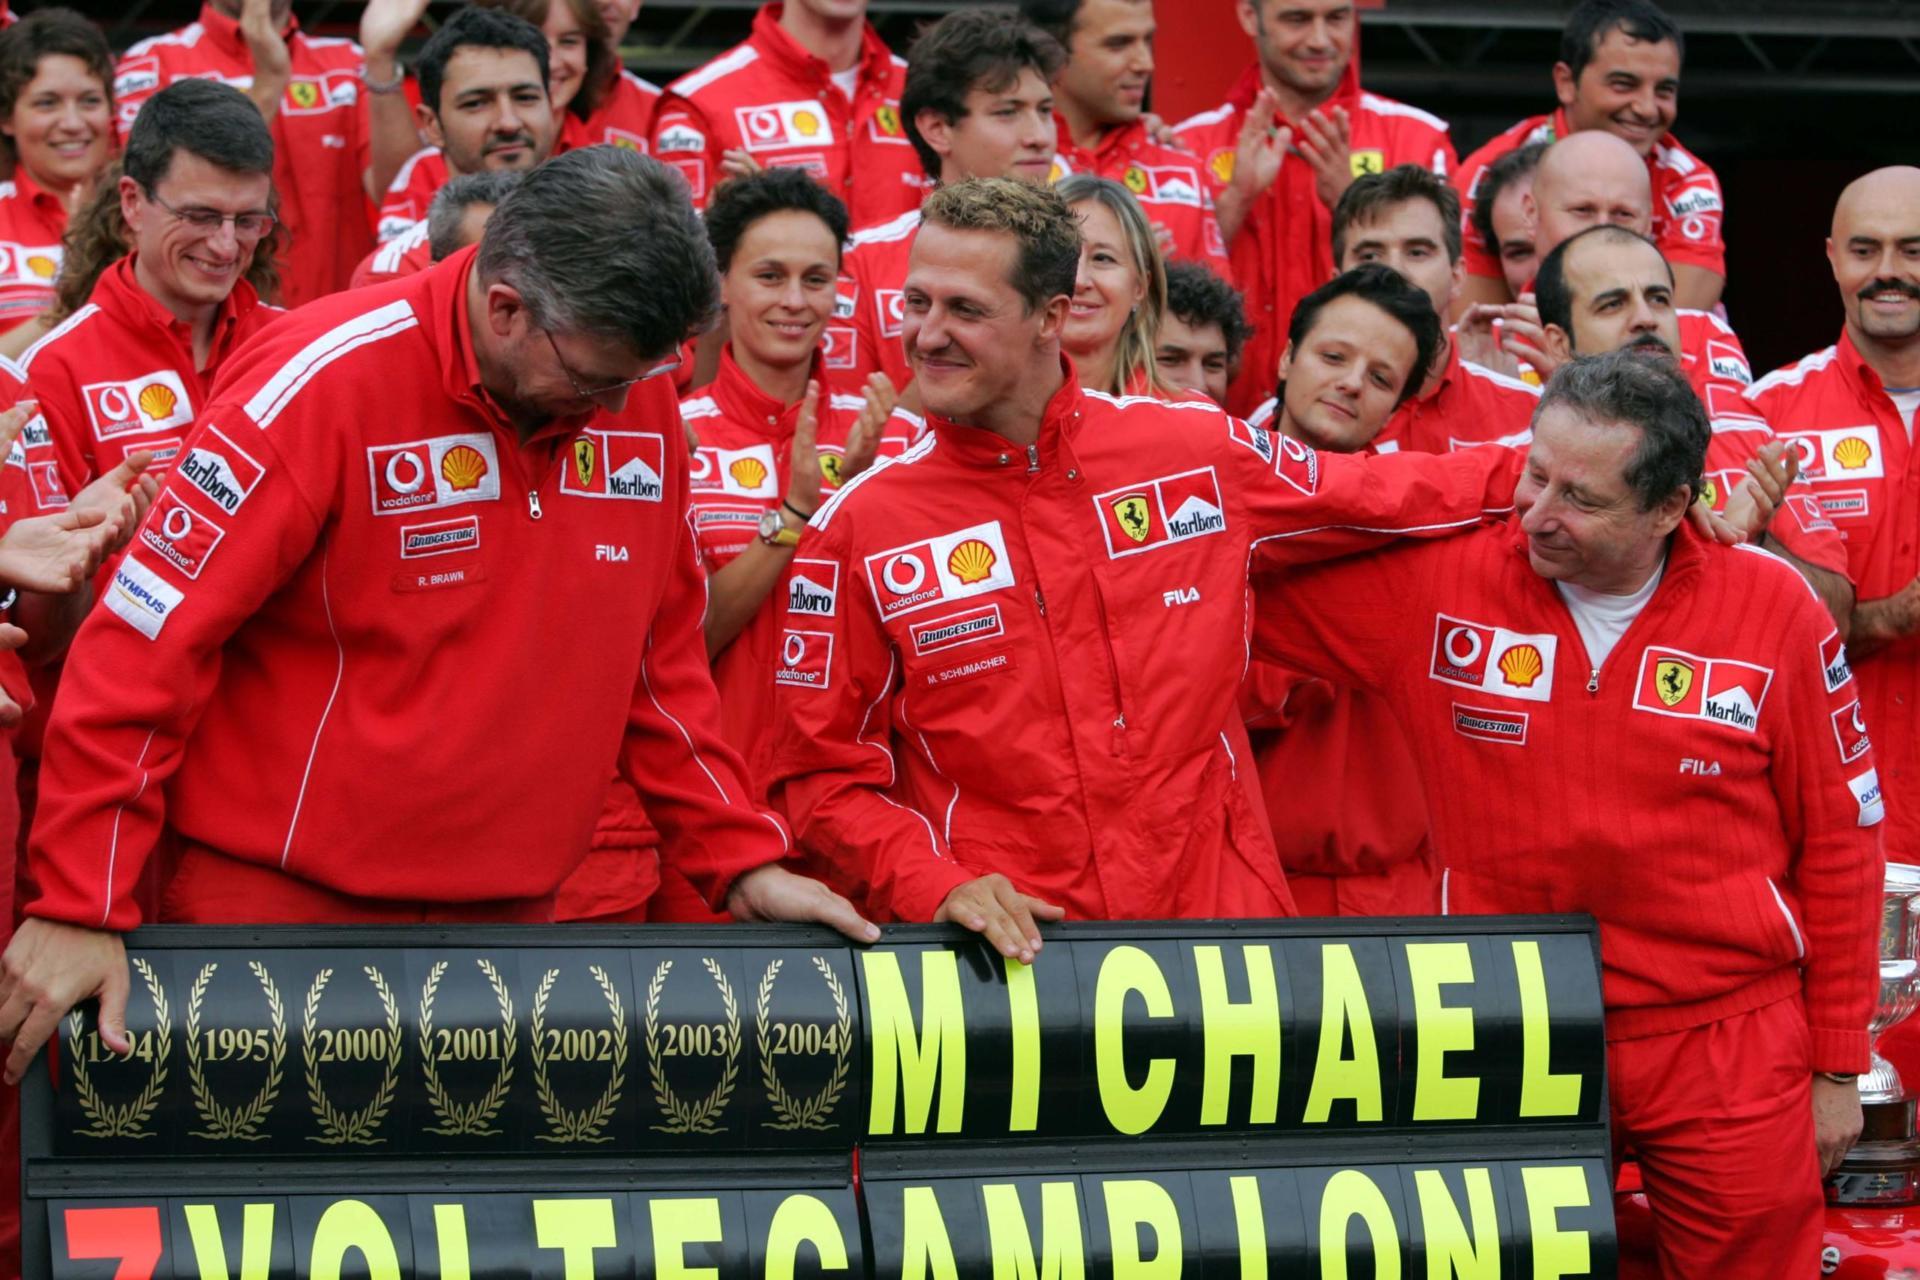 Michael Schumacher Left Ferrari In 2006 After The Team Opted To Sign Kimi Raikkonen